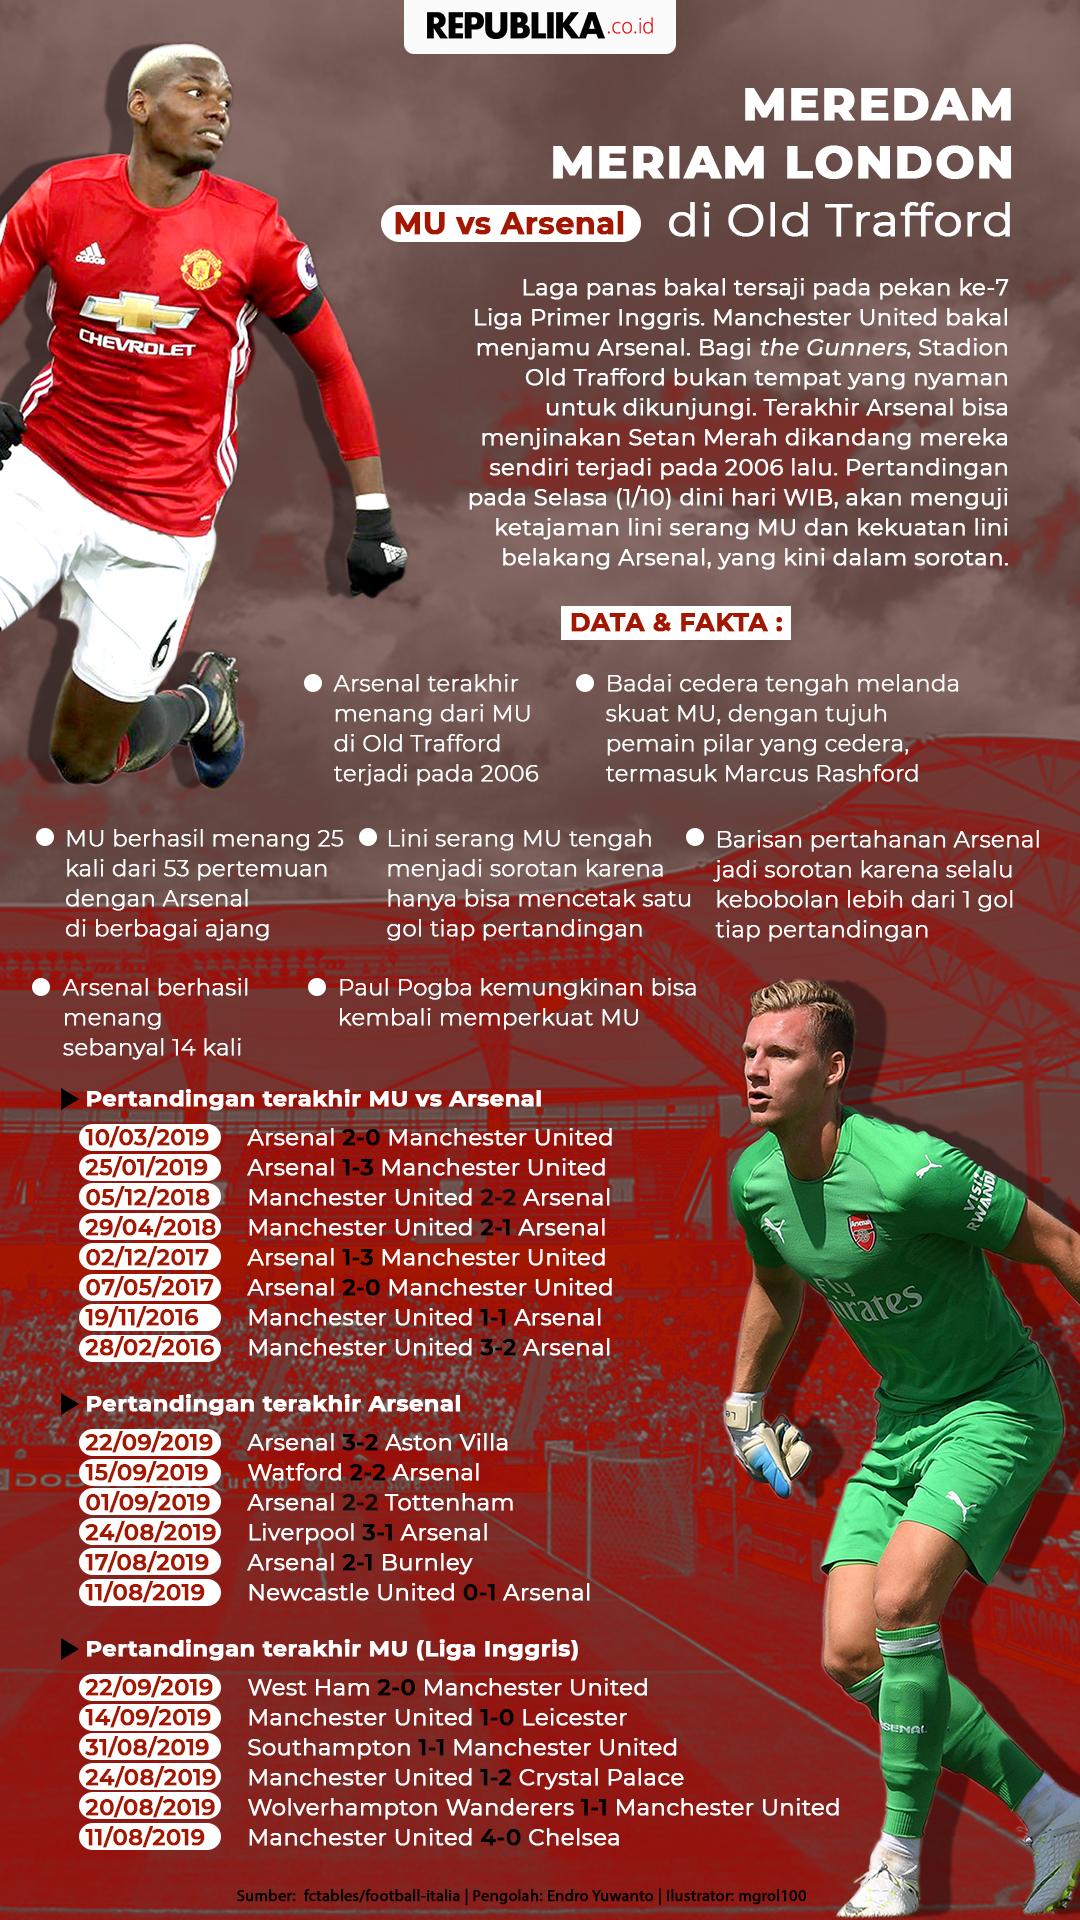 MU Vs Arsenal Upaya Meredam Meriam London